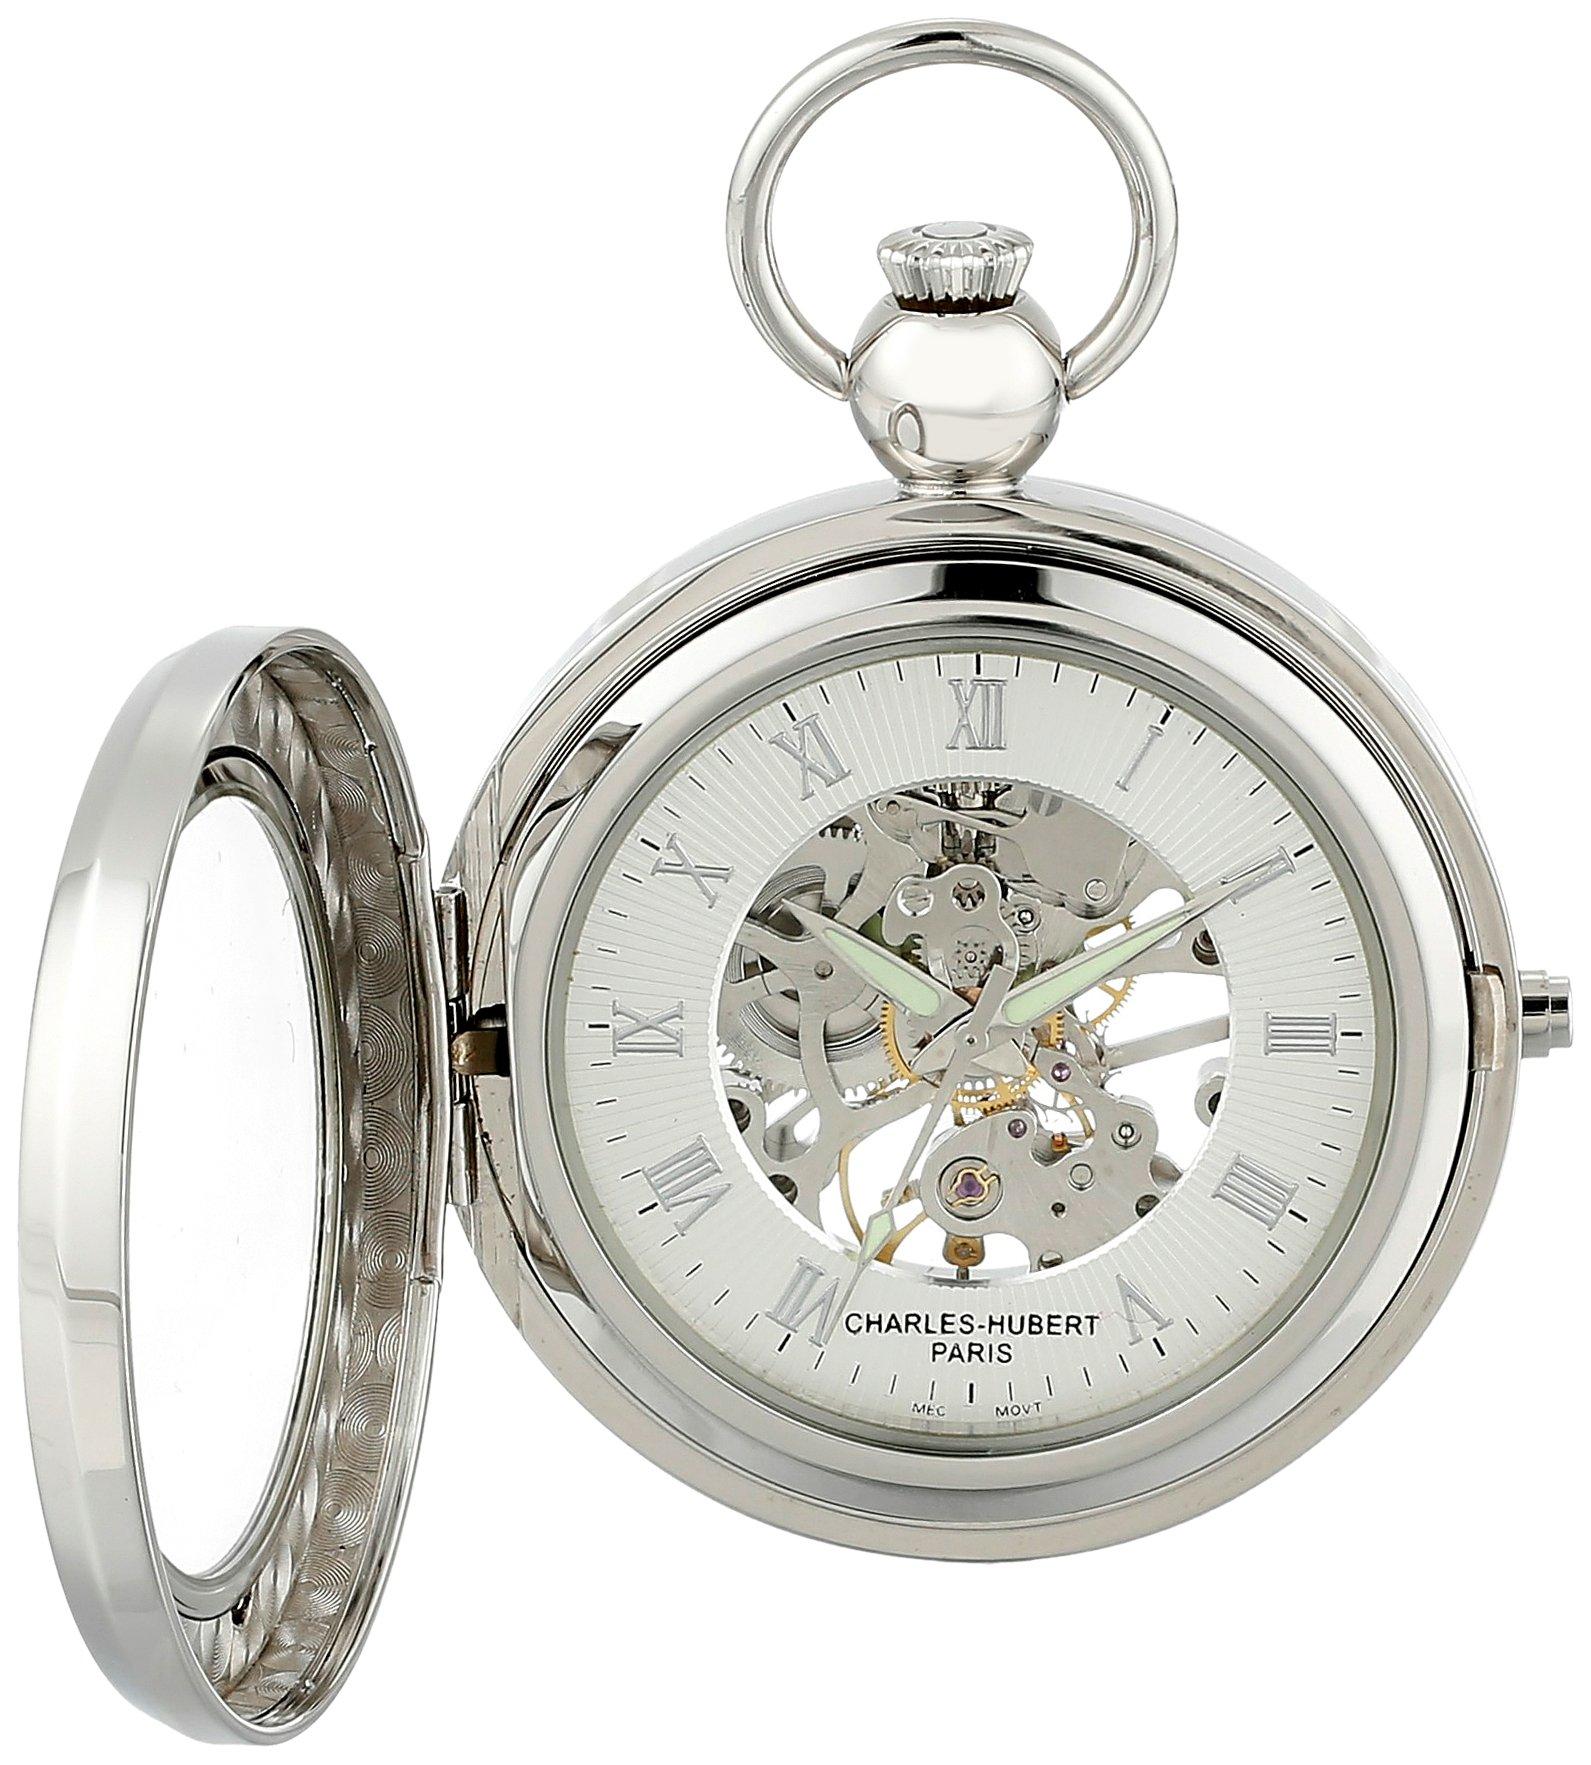 Charles Hubert 3849 Mechanical Picture Frame Pocket Watch by CHARLES-HUBERT PARIS (Image #1)